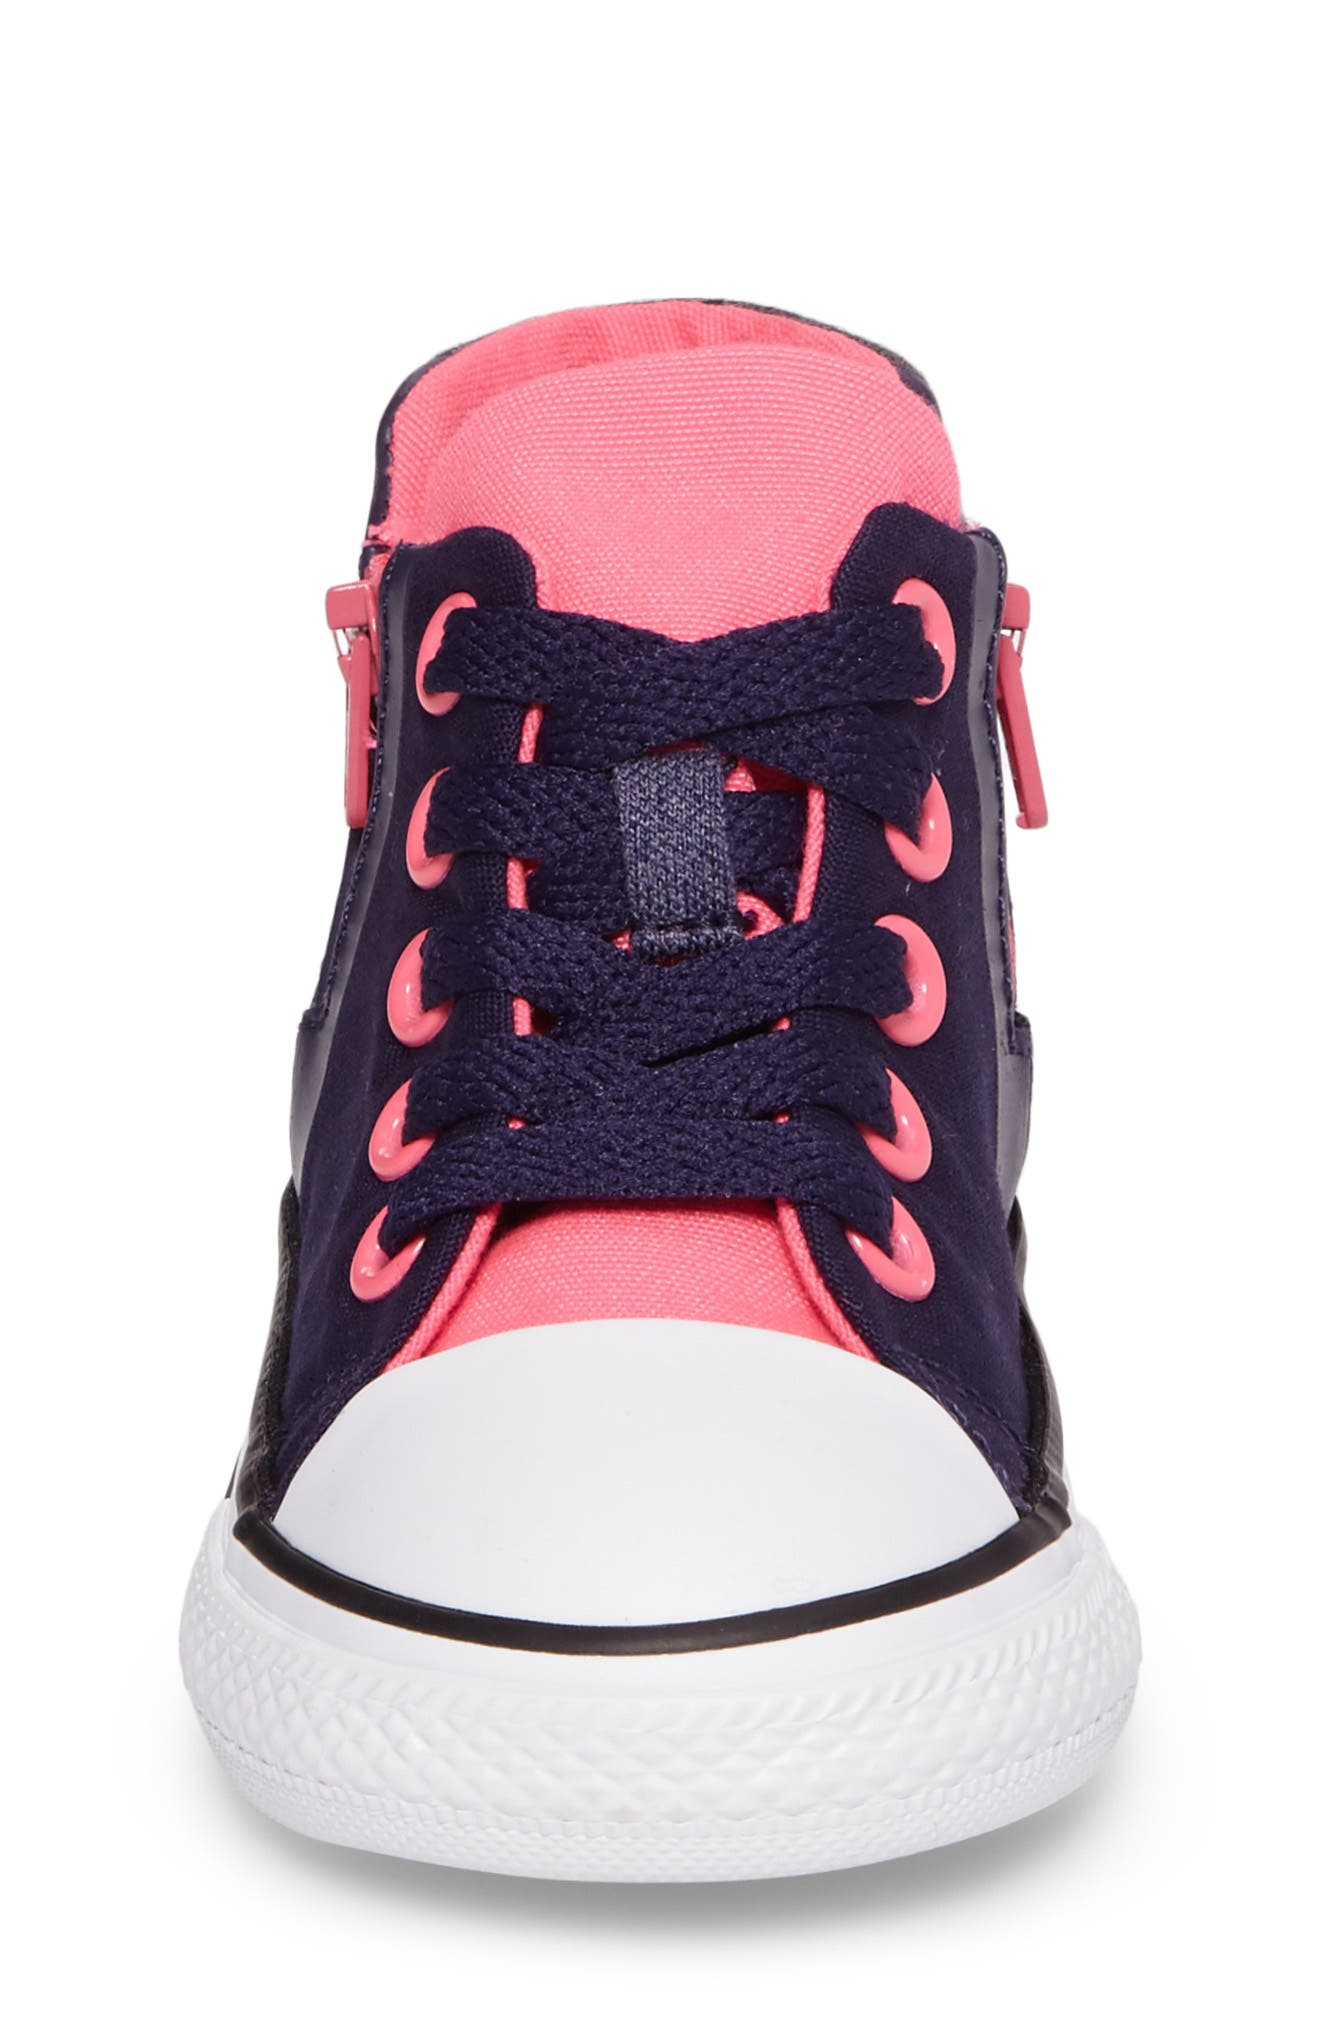 Alternate Image 4  - Converse Chuck Taylor® All Star® Sport Zip High Top Sneaker (Baby, Walker, Toddler, Little Kid & Big Kid)